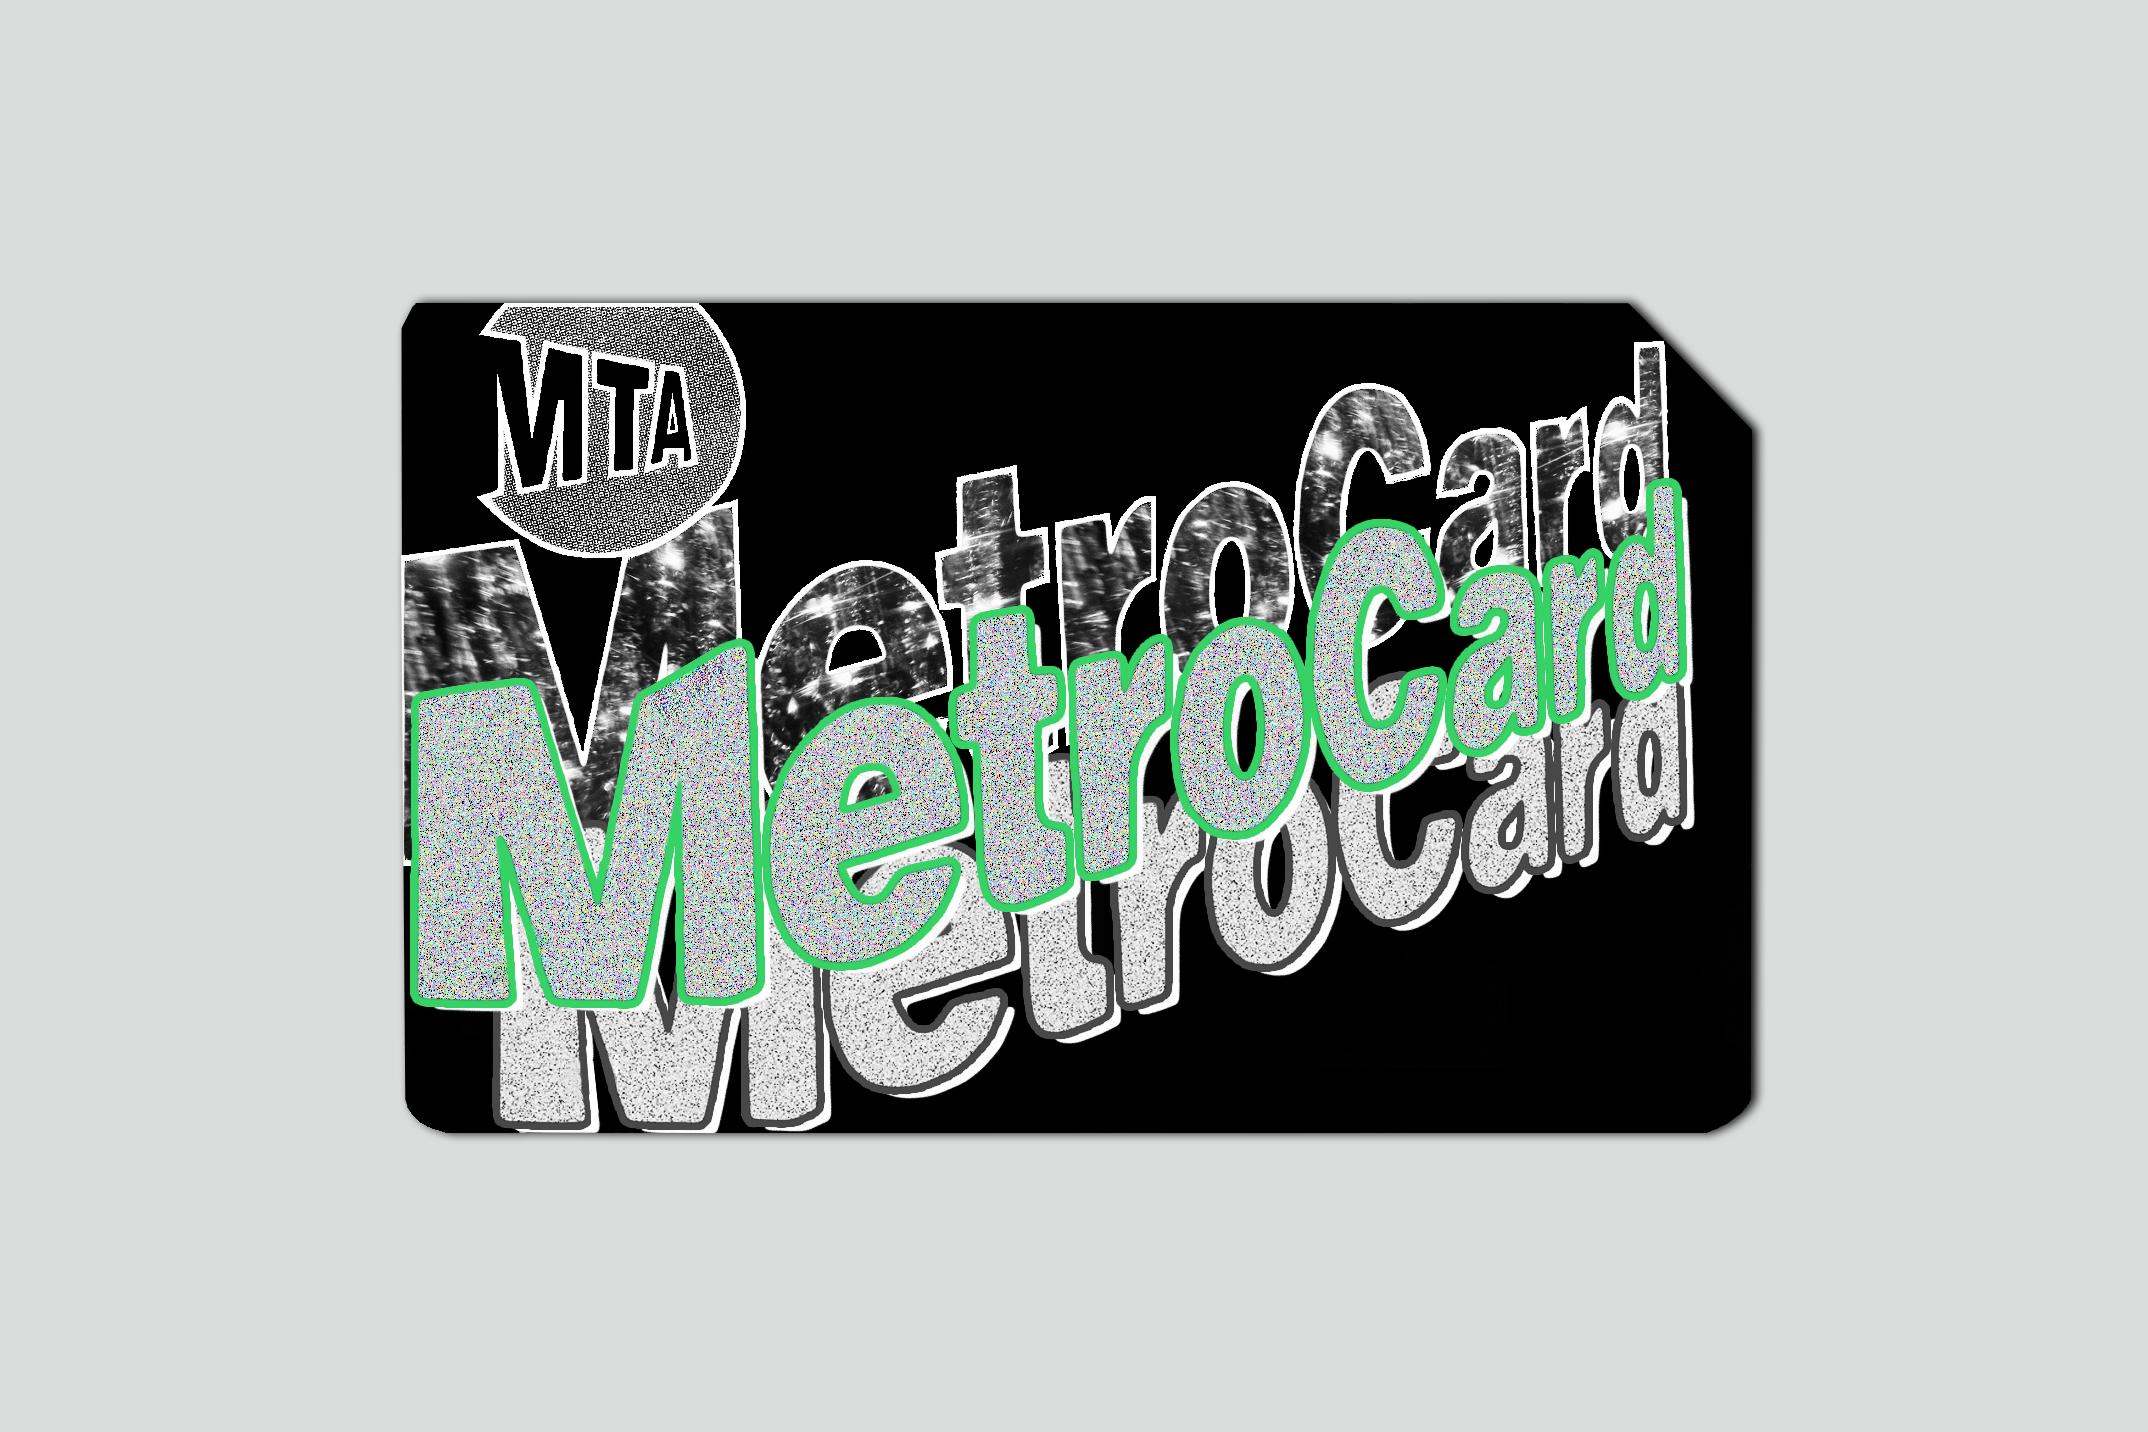 MetroCard Redesign